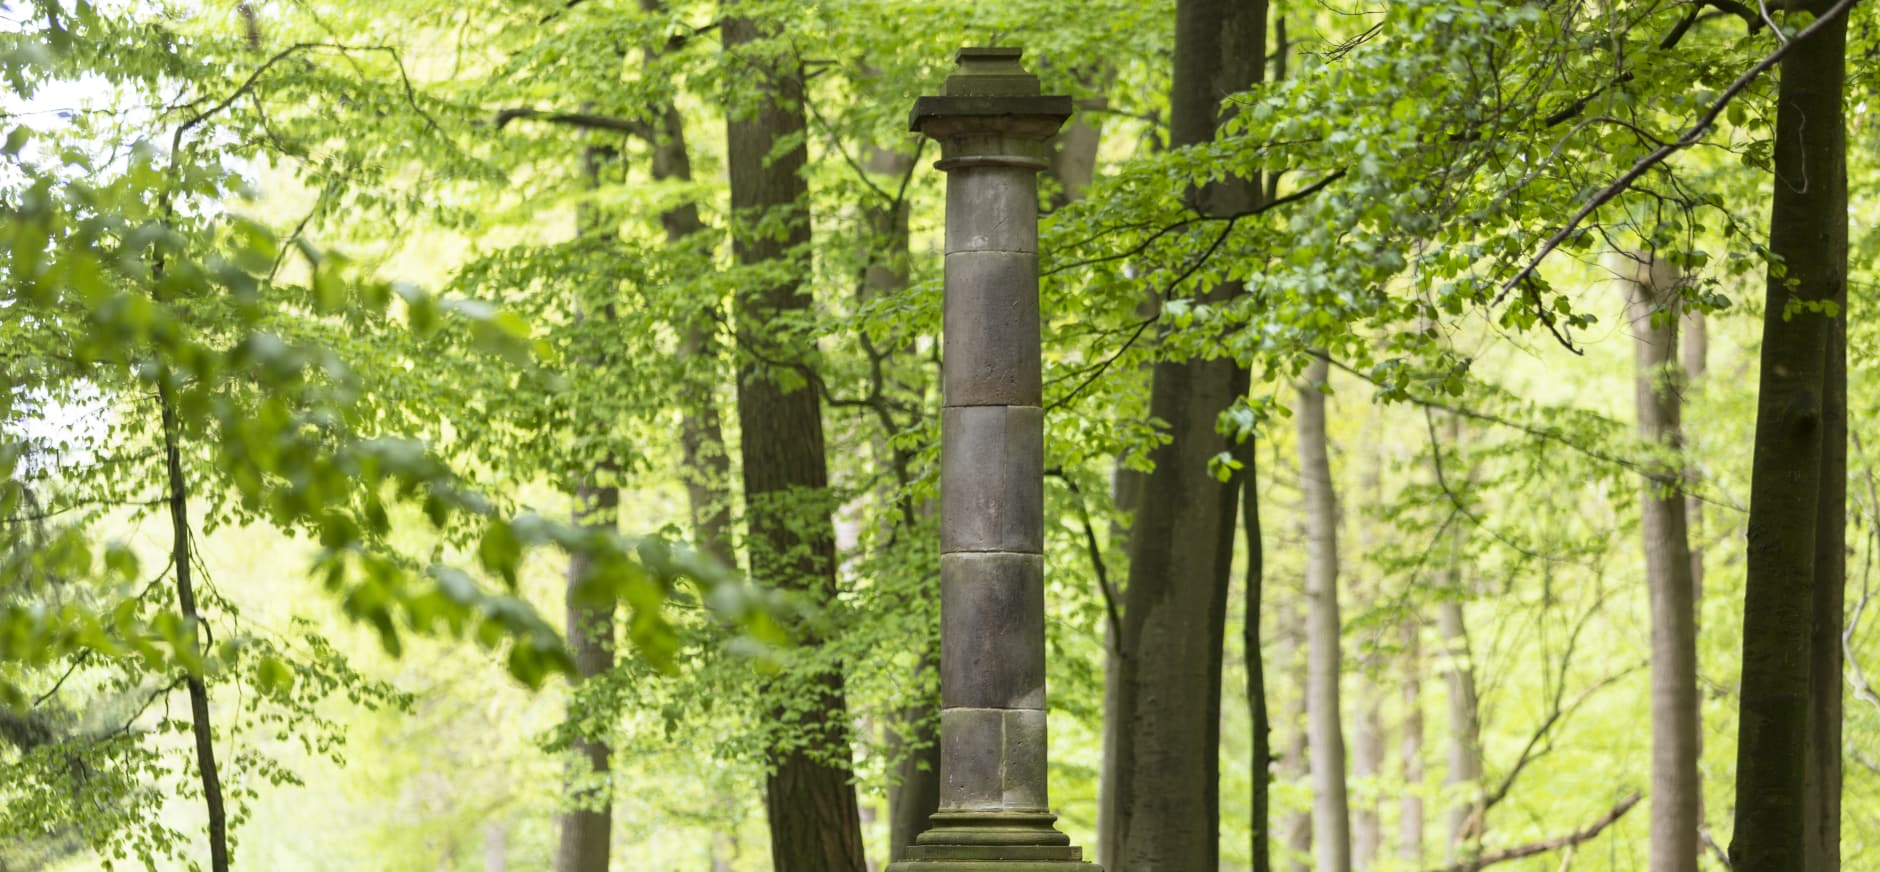 Slotplaats Johann Hermann Knoop